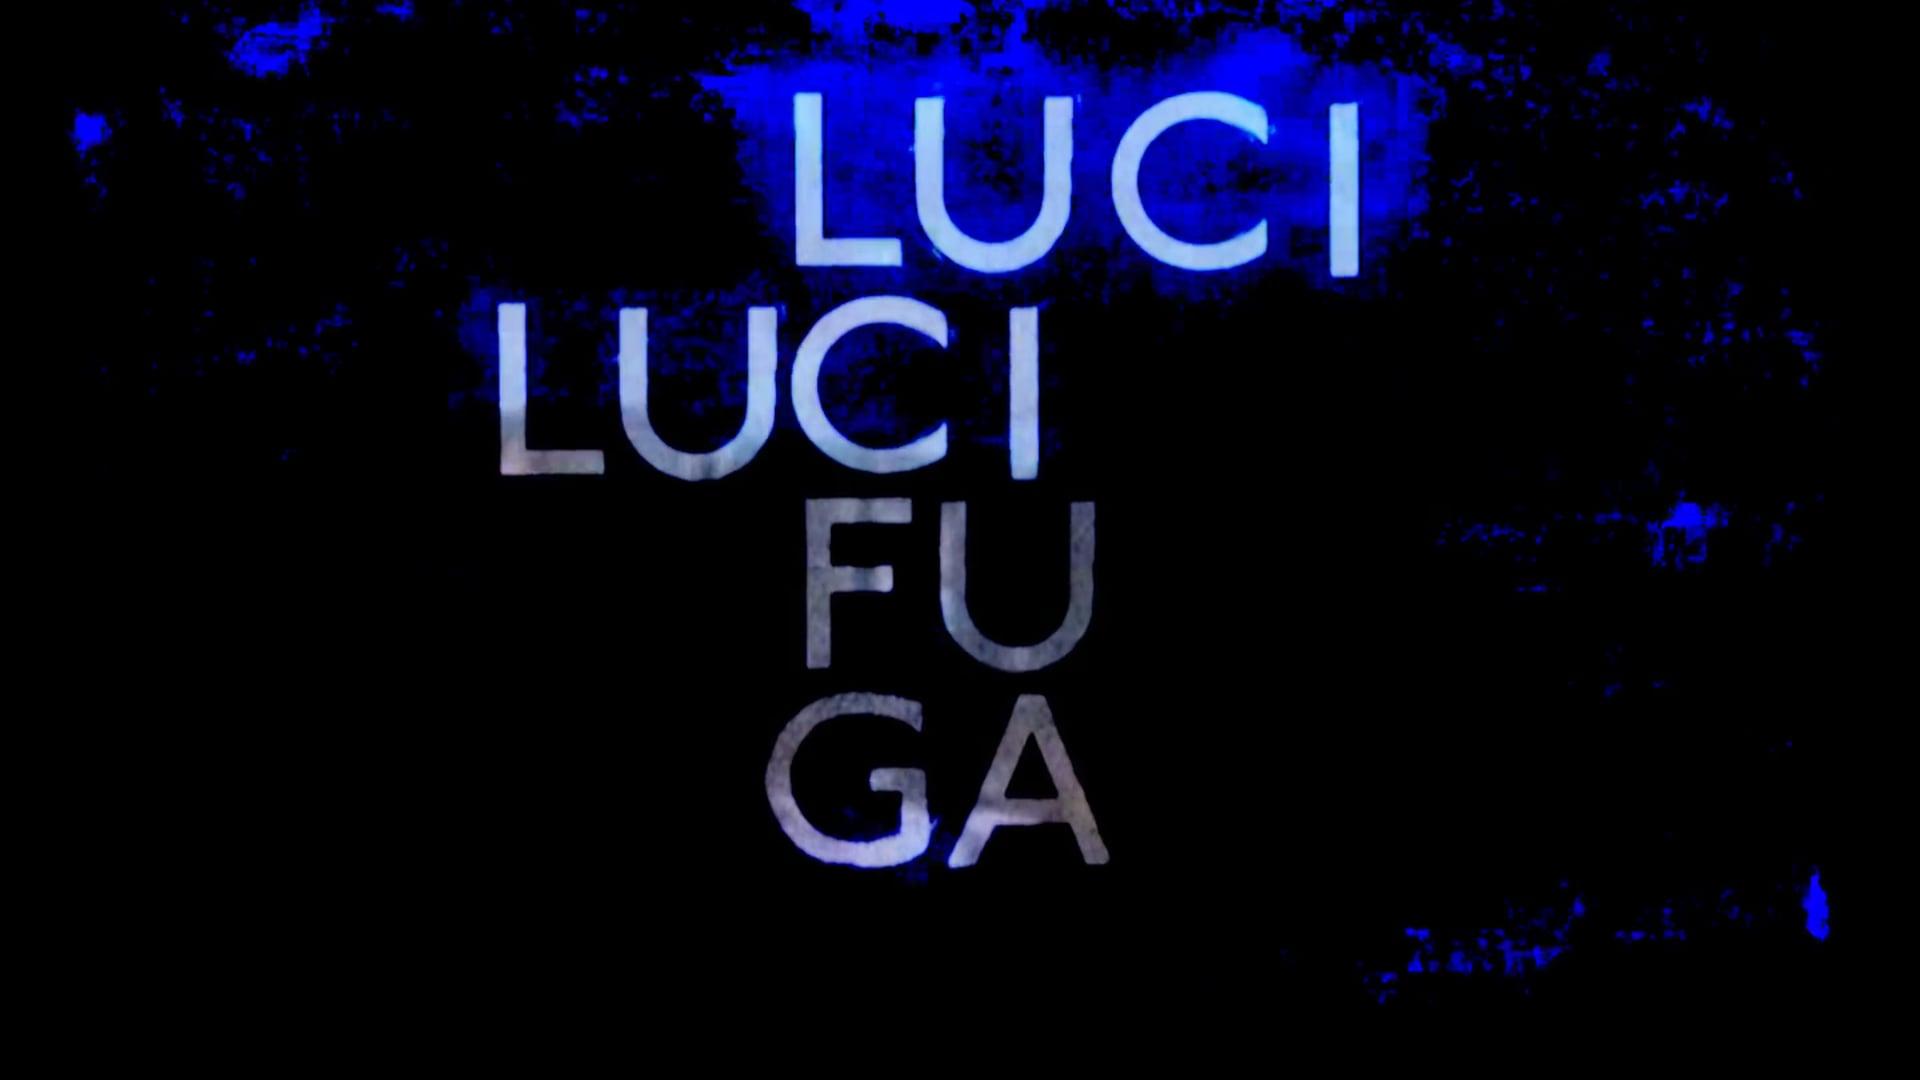 LUCIFUGA - TEASER